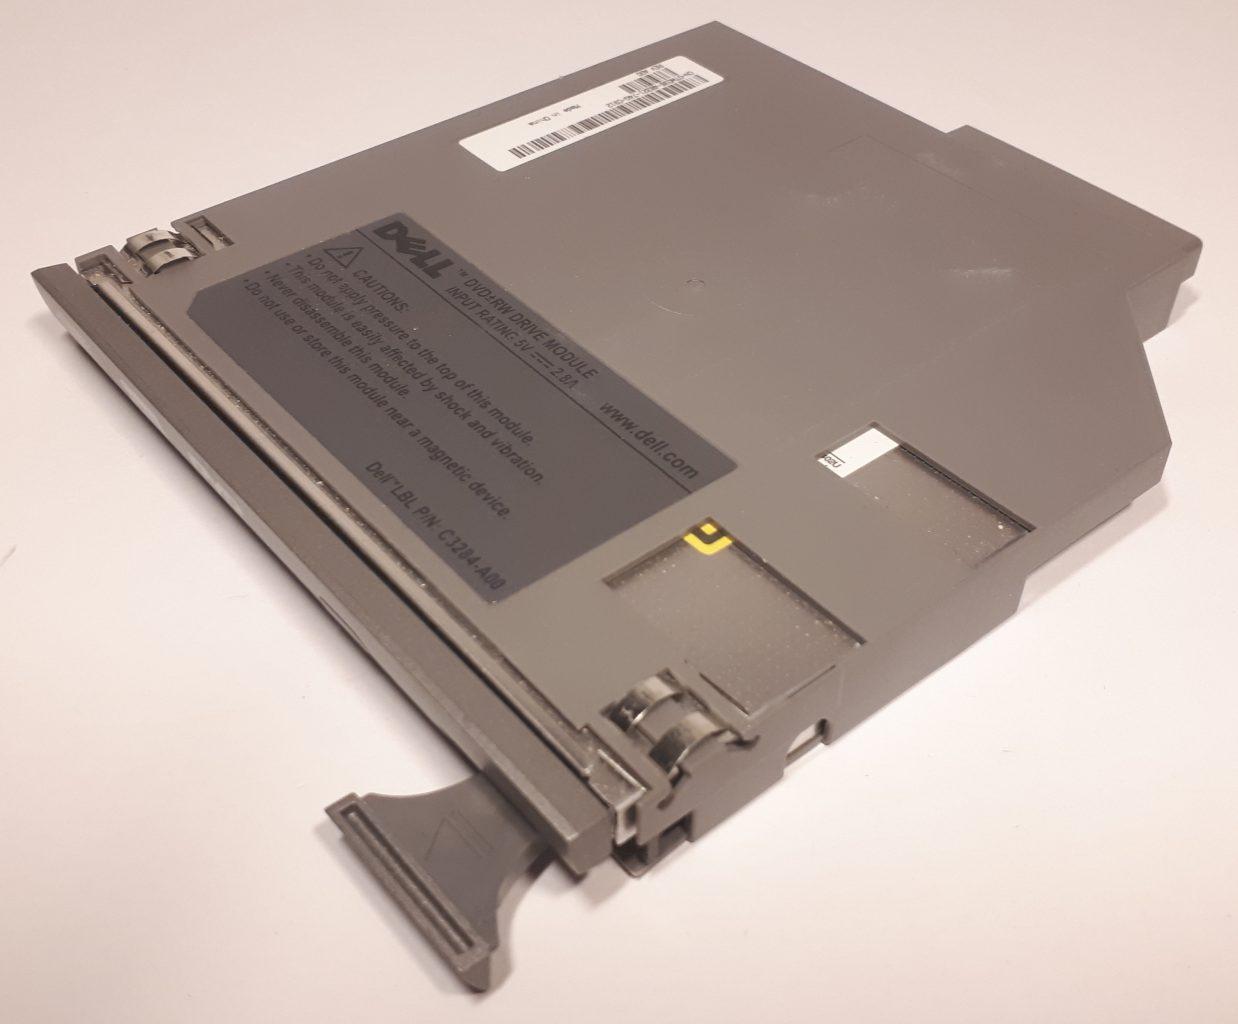 Dell D630 DVD drive